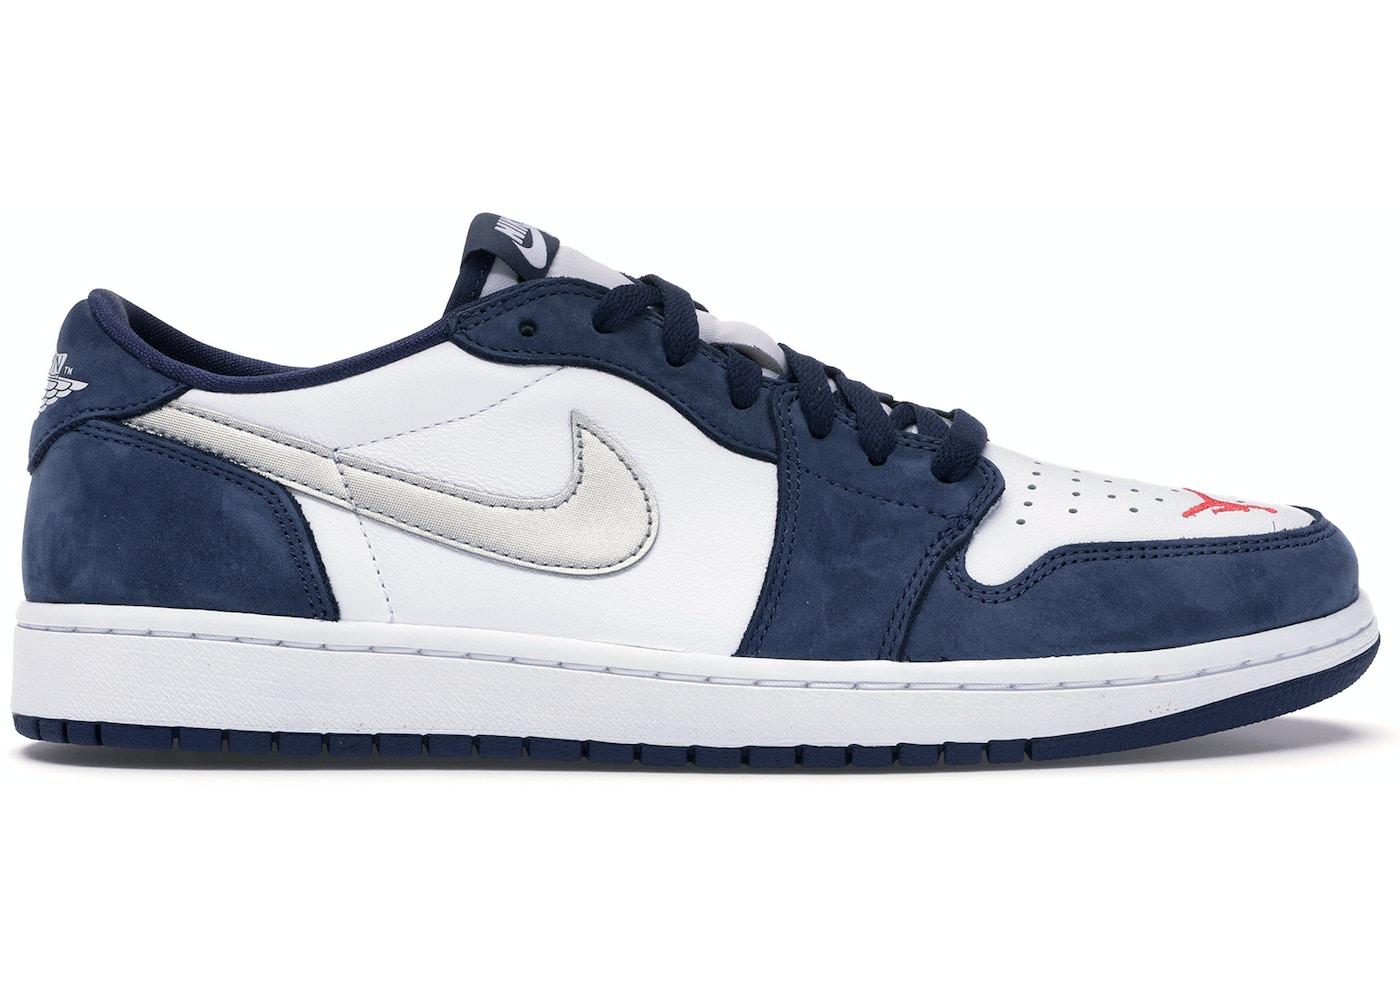 quality design 8ce94 1413c Buy Air Jordan Shoes   Deadstock Sneakers